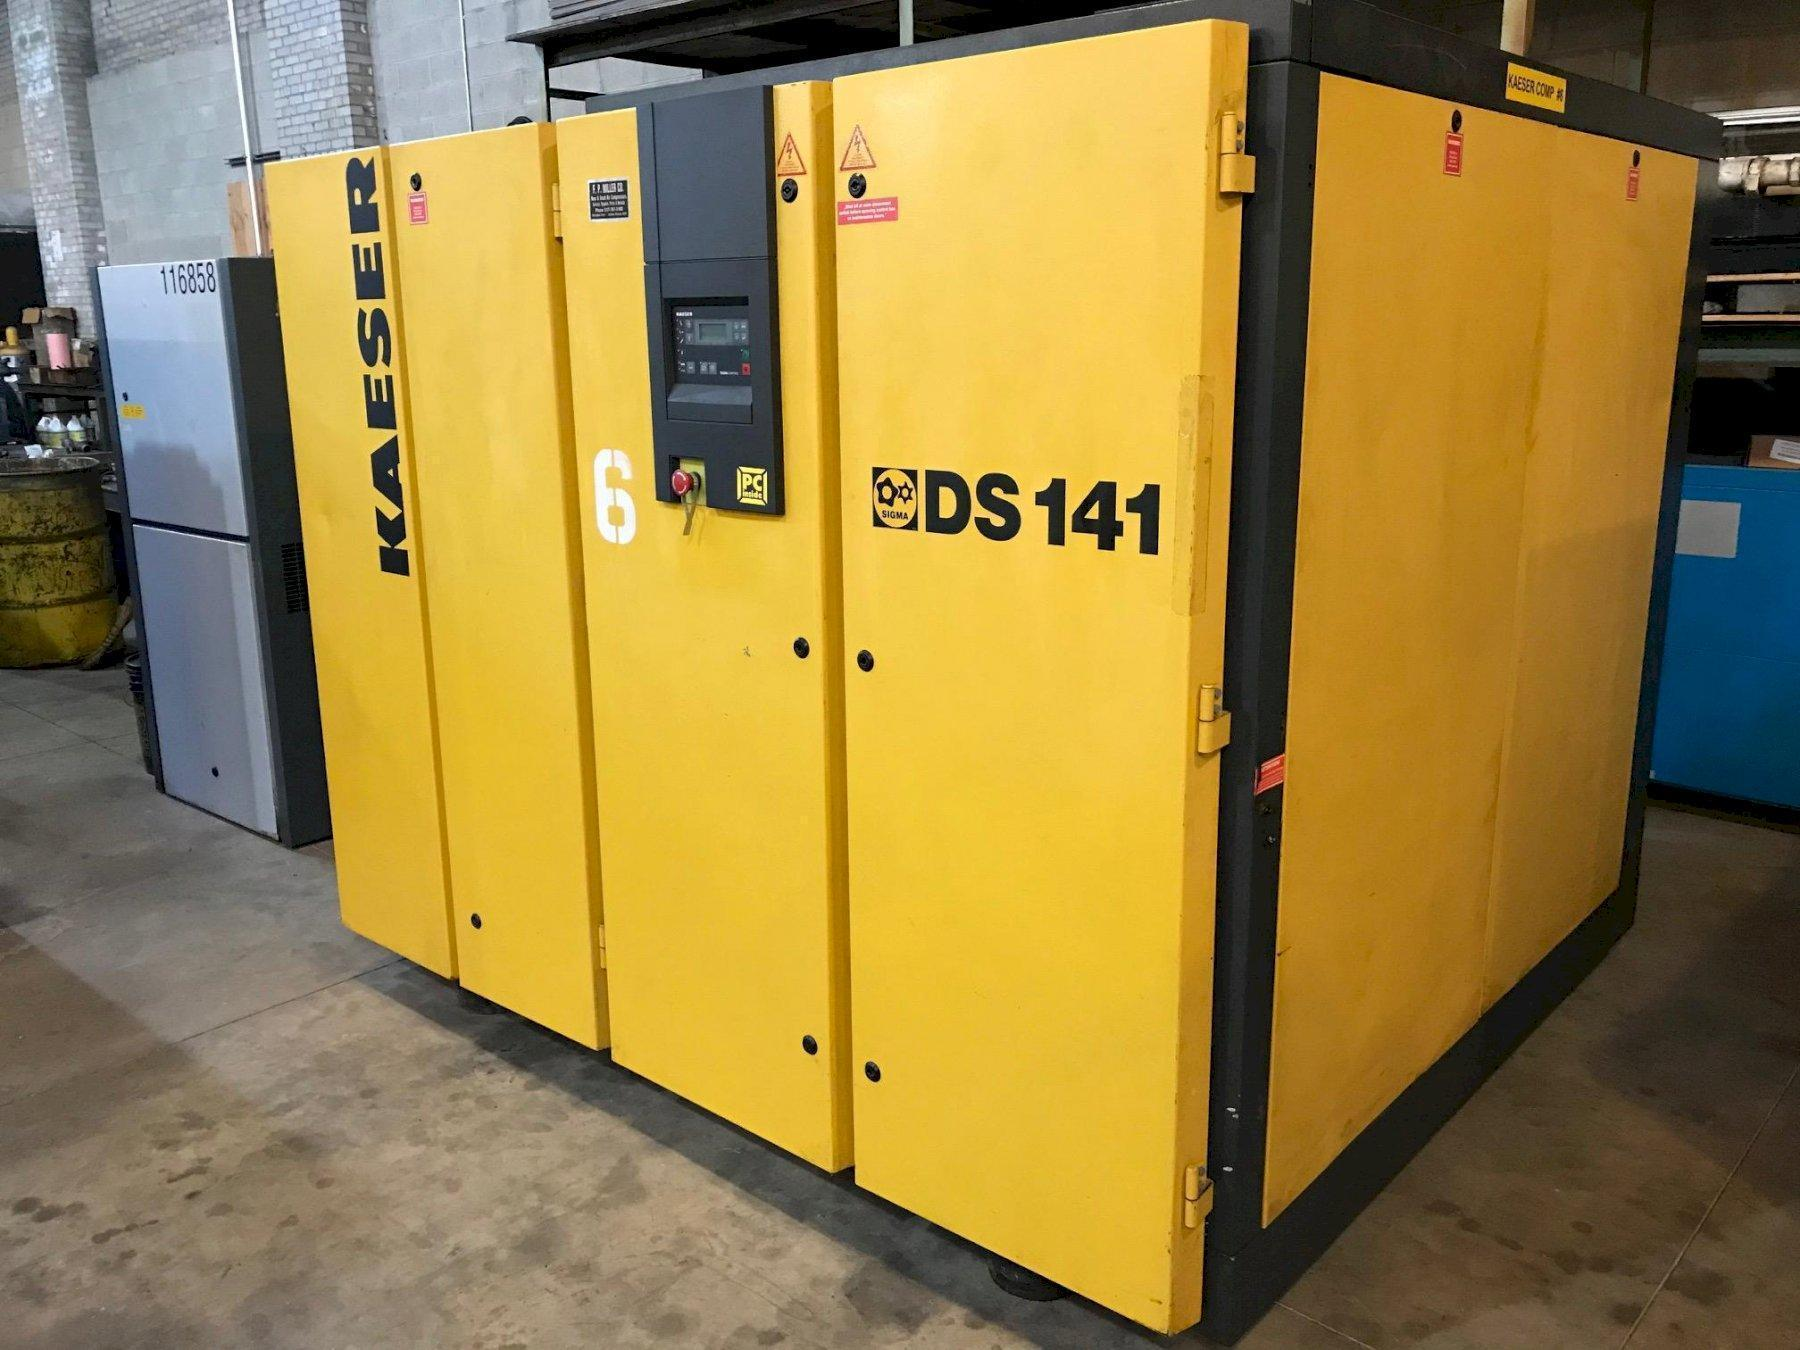 100 HP KAESER DS 141 ROTARY SCREW/SLIDING VANE AIR COMPRESSOR